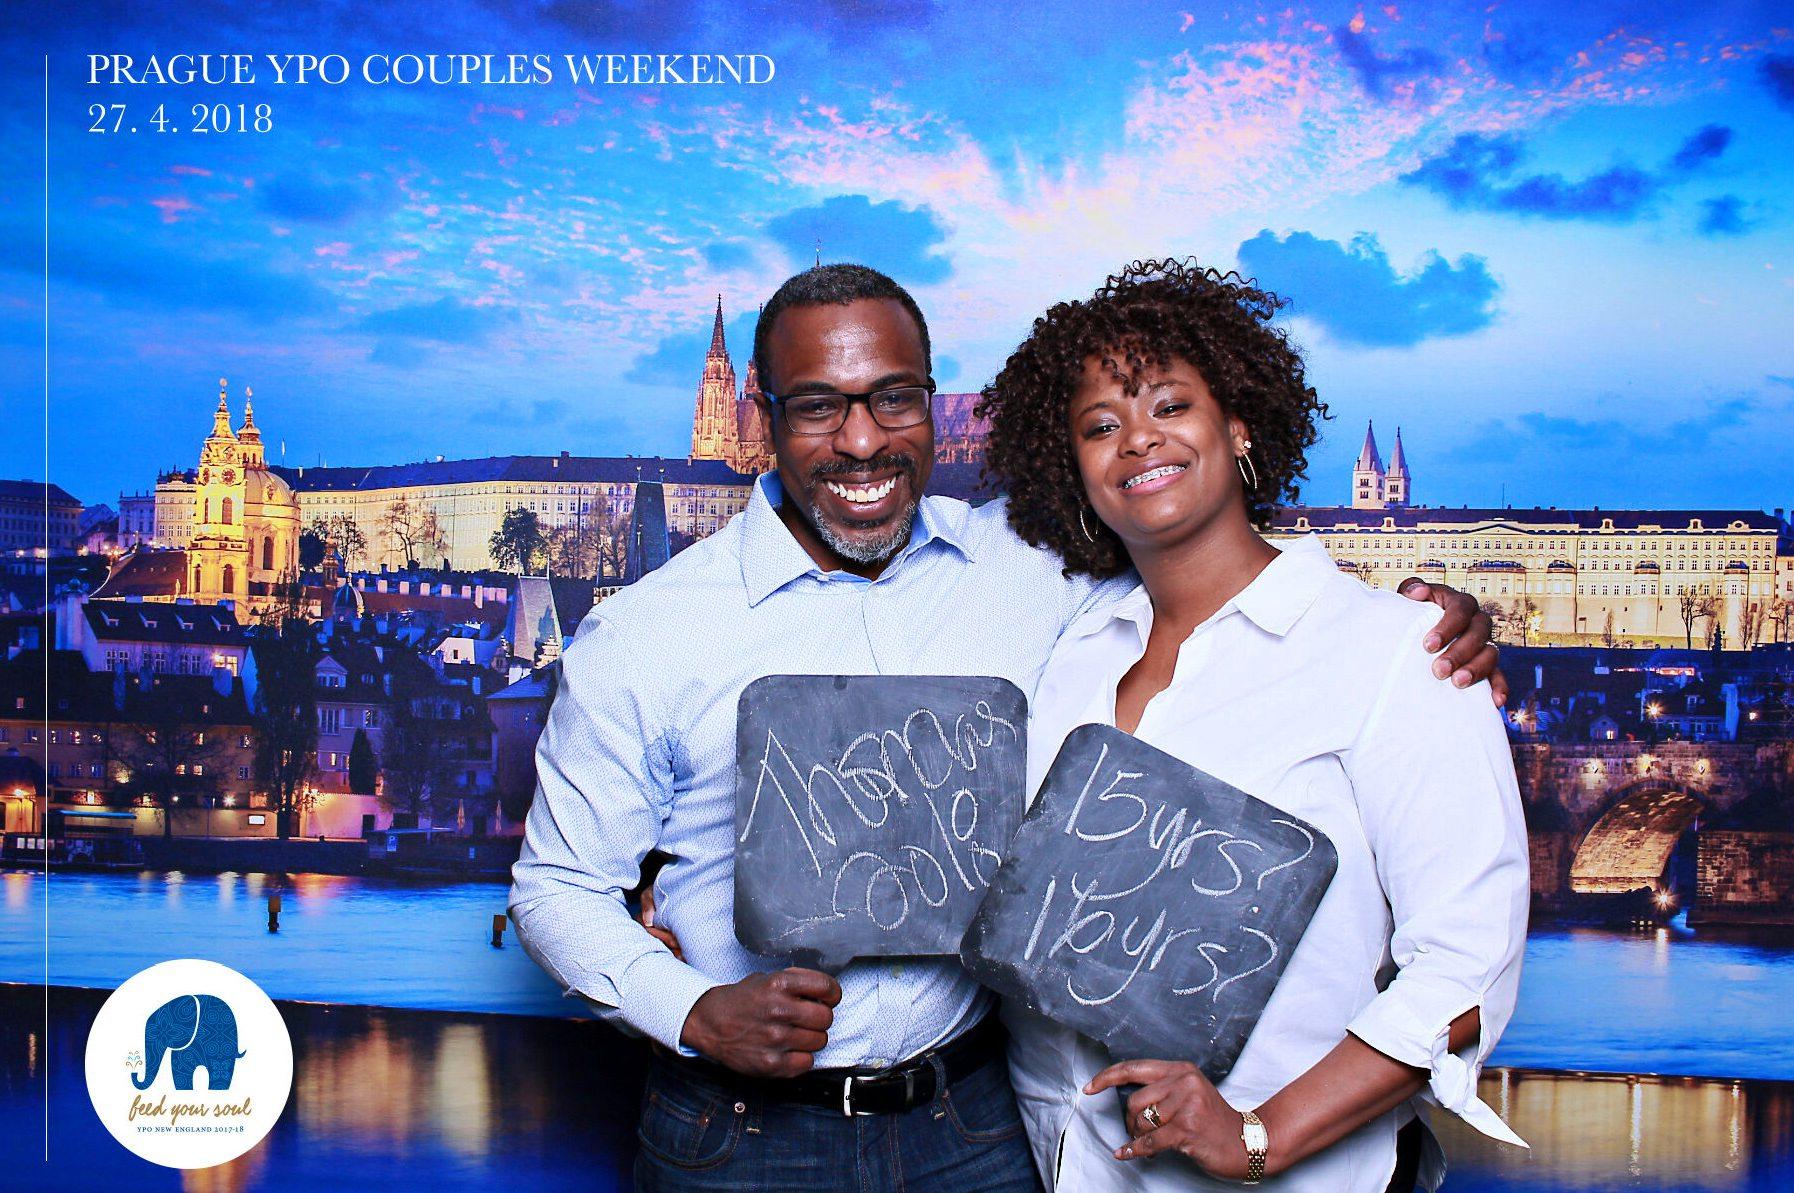 fotokoutek-prague-ypo-couples-weekend-27-4-2018-413486